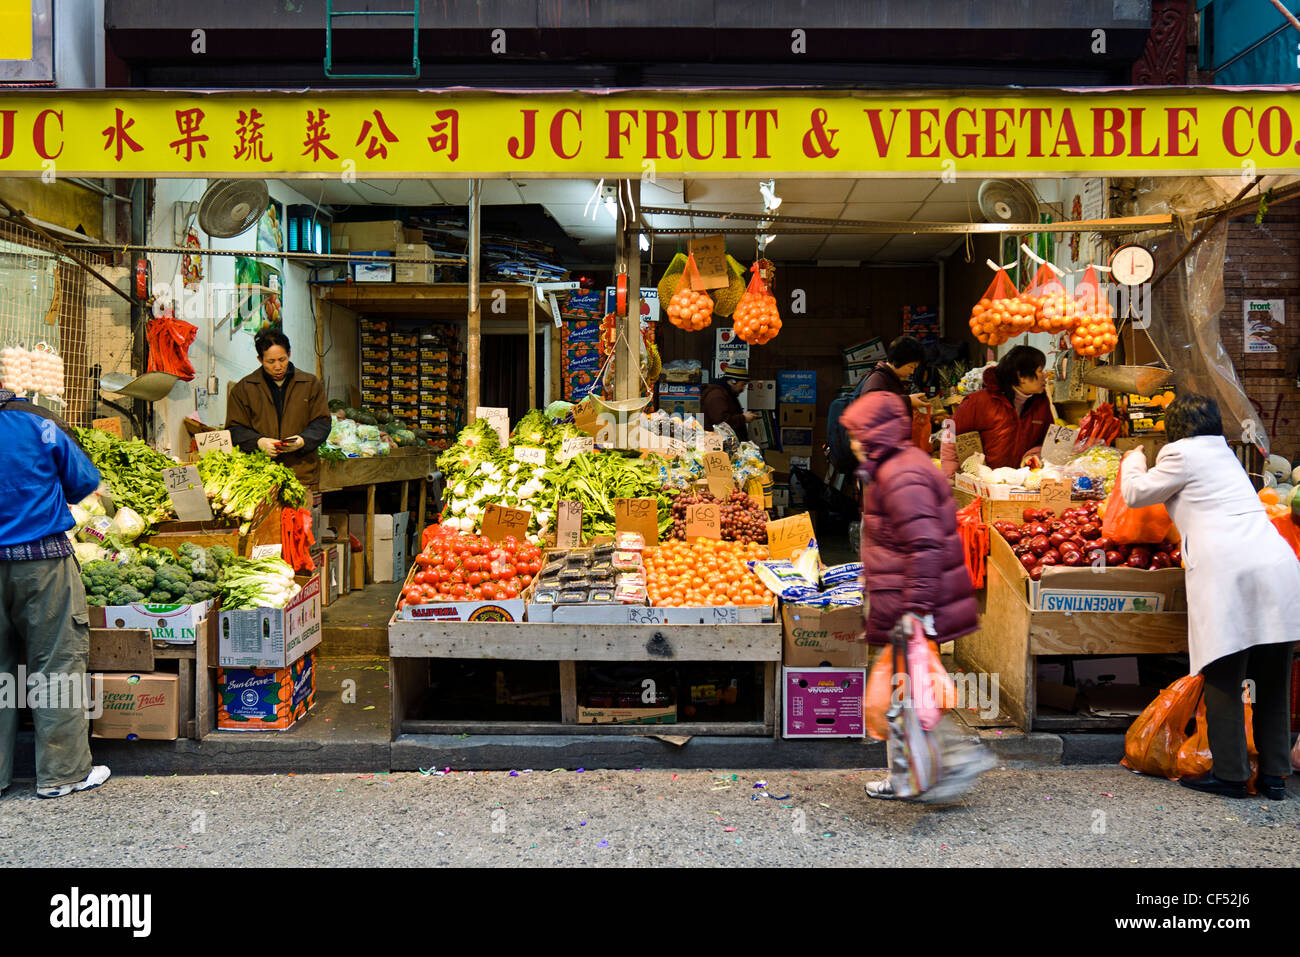 Outdoor Market On Mott Street Chinatown New York City Stock Photo Alamy